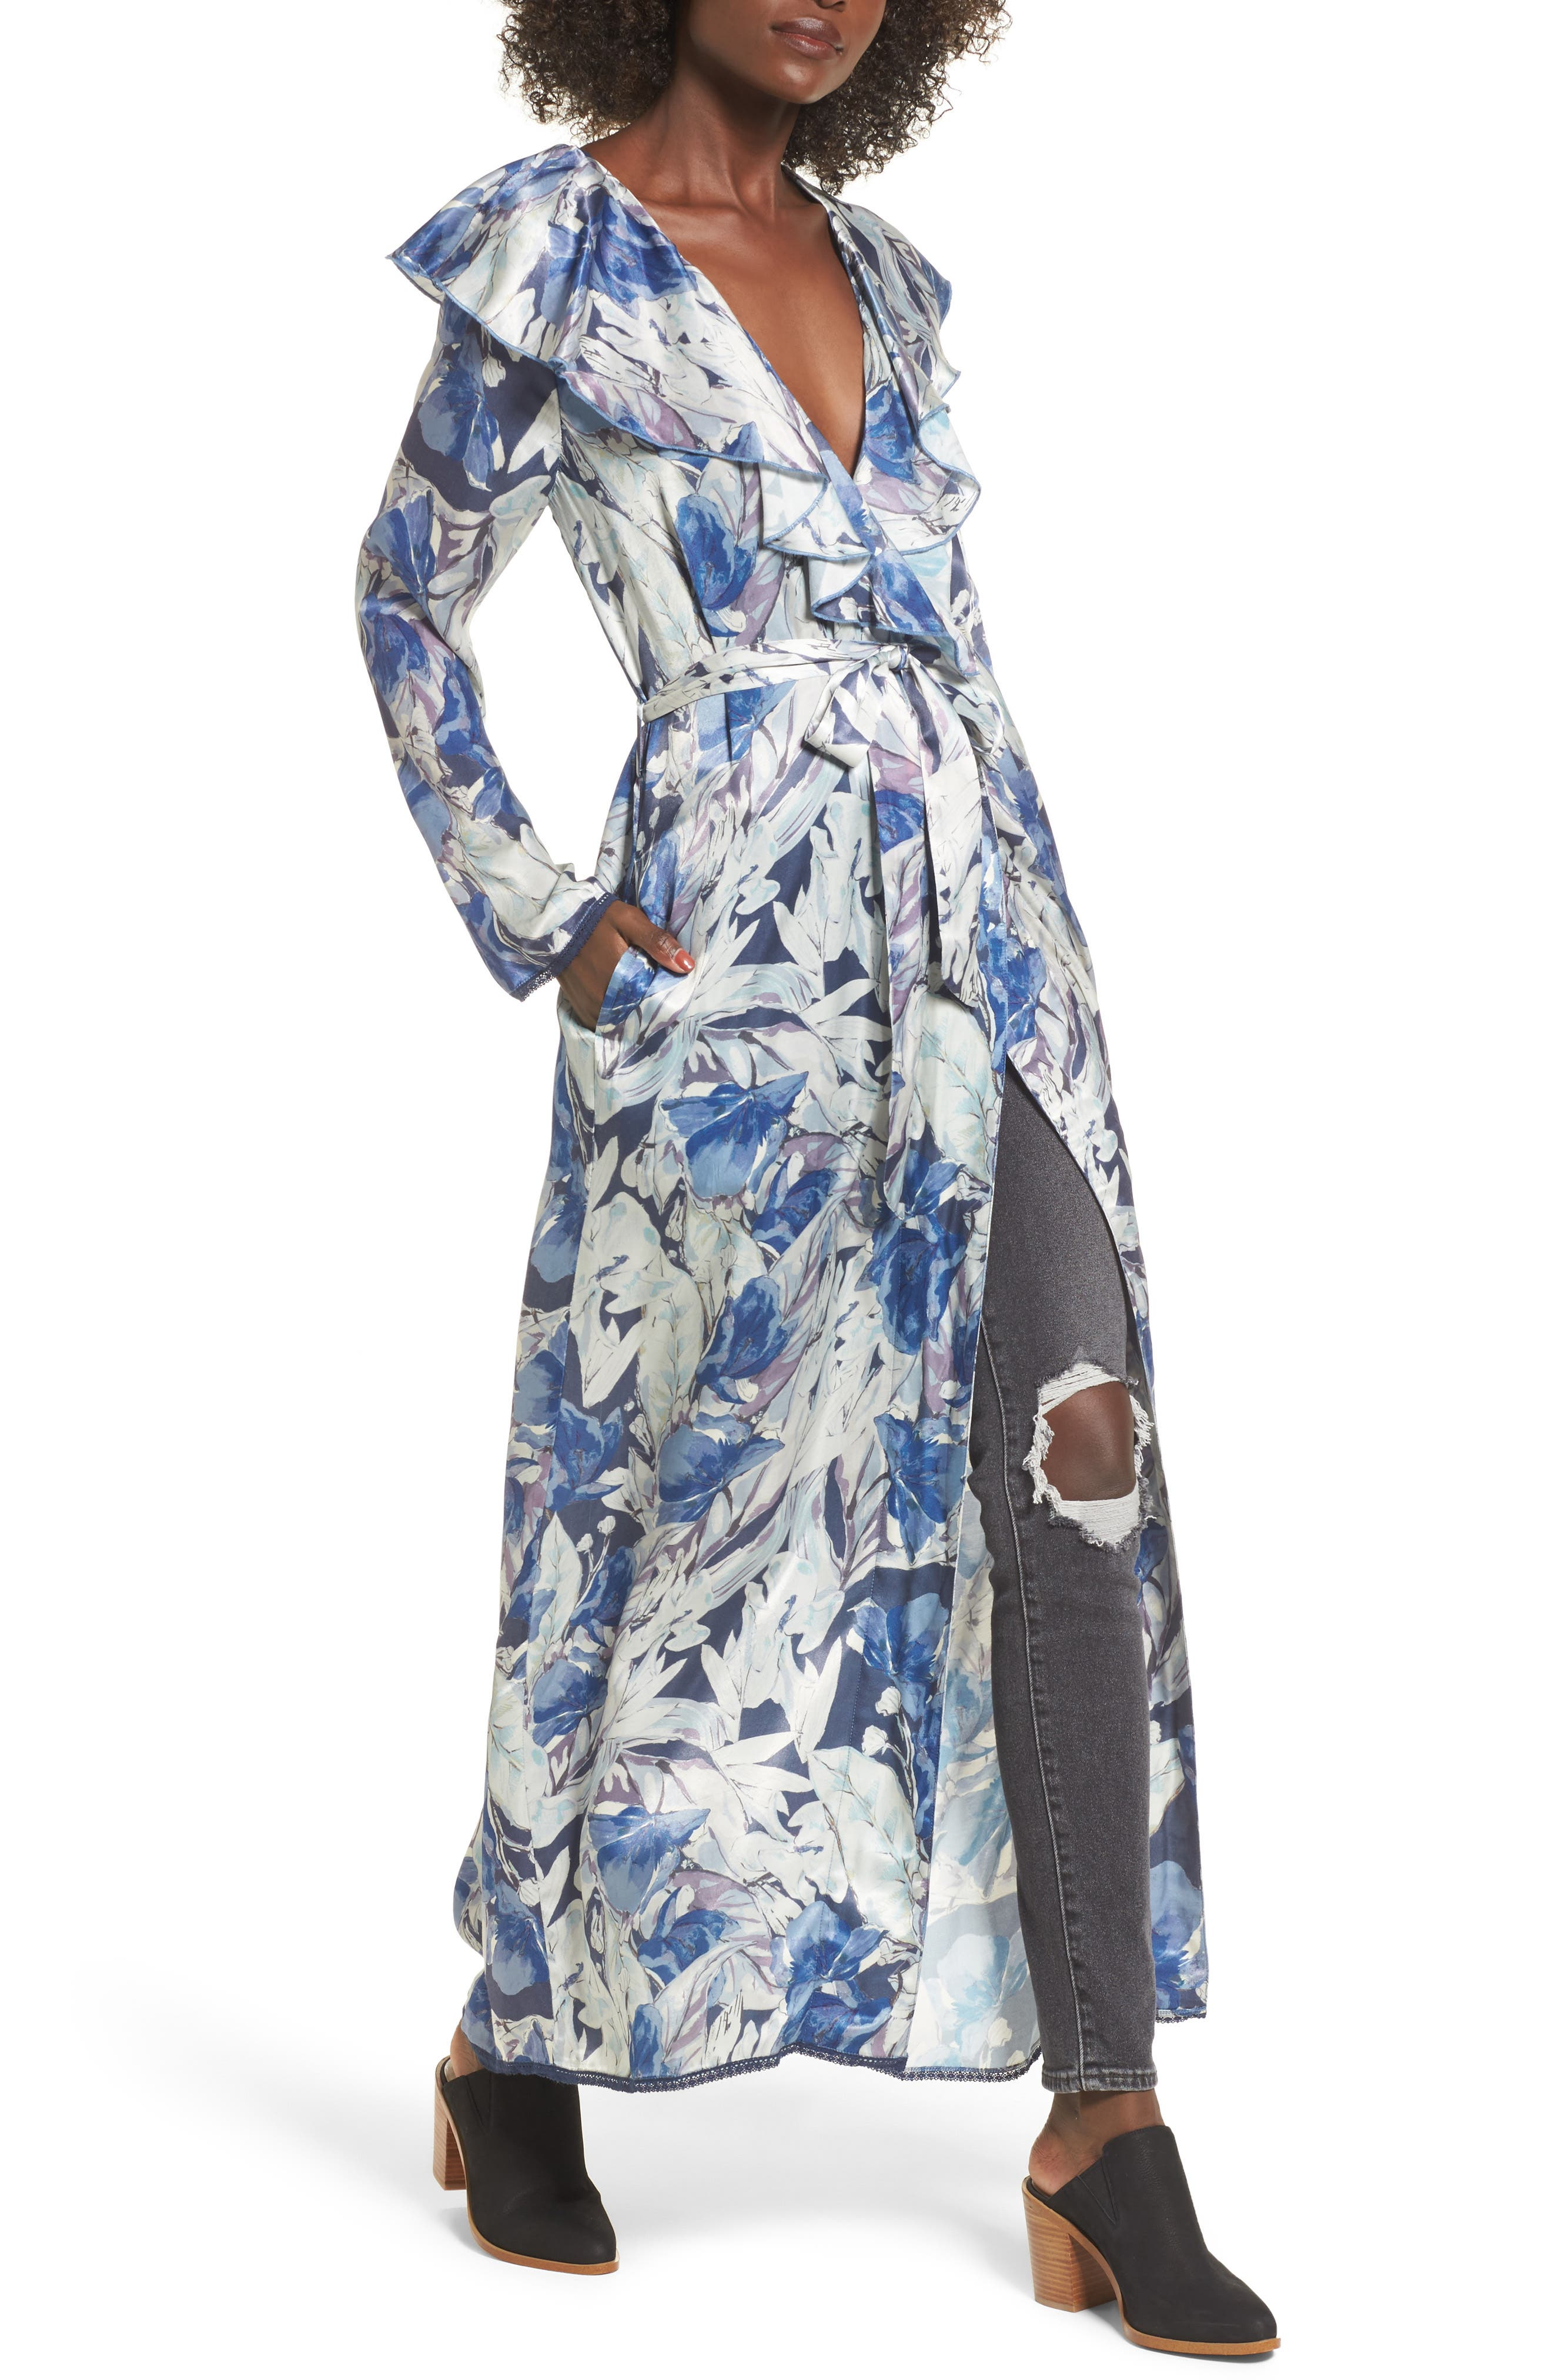 Main Image - Tularosa Drucilla Floral Print Duster